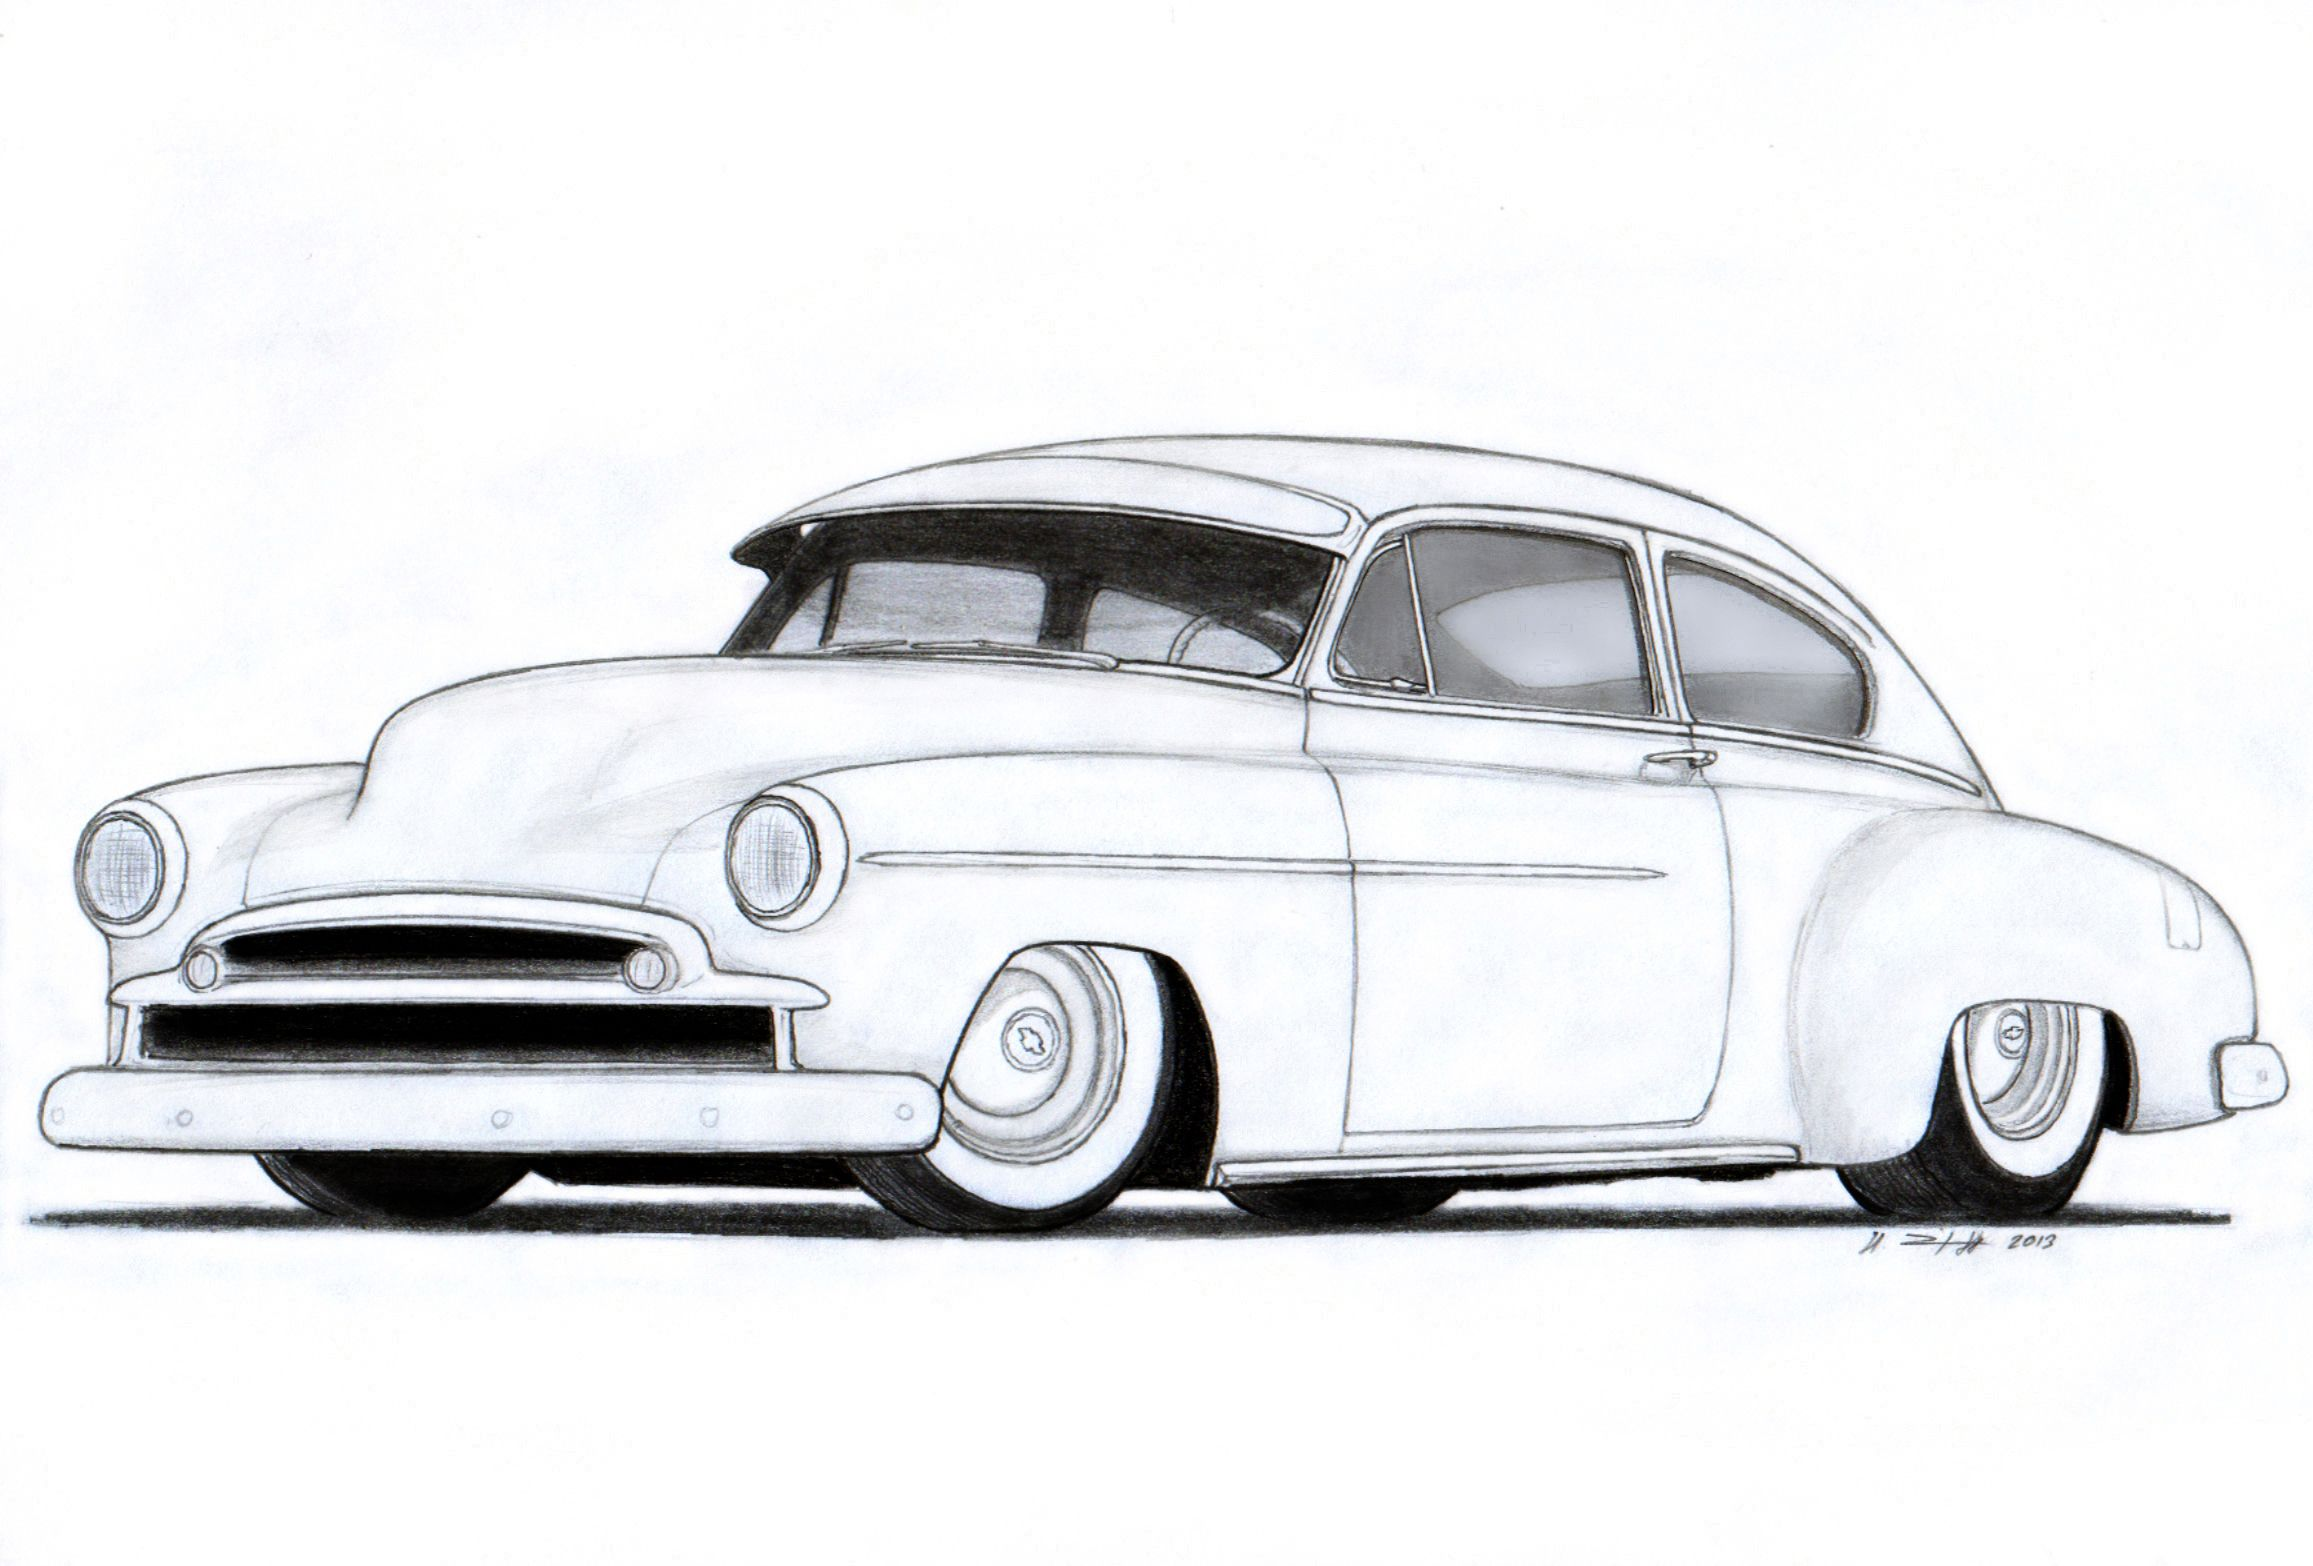 1949 Chevrolet Fleetline Custom Coupe Drawing By Vertualissimo Deviantart Com On Deviantart Malarbocker Bilar Fordon